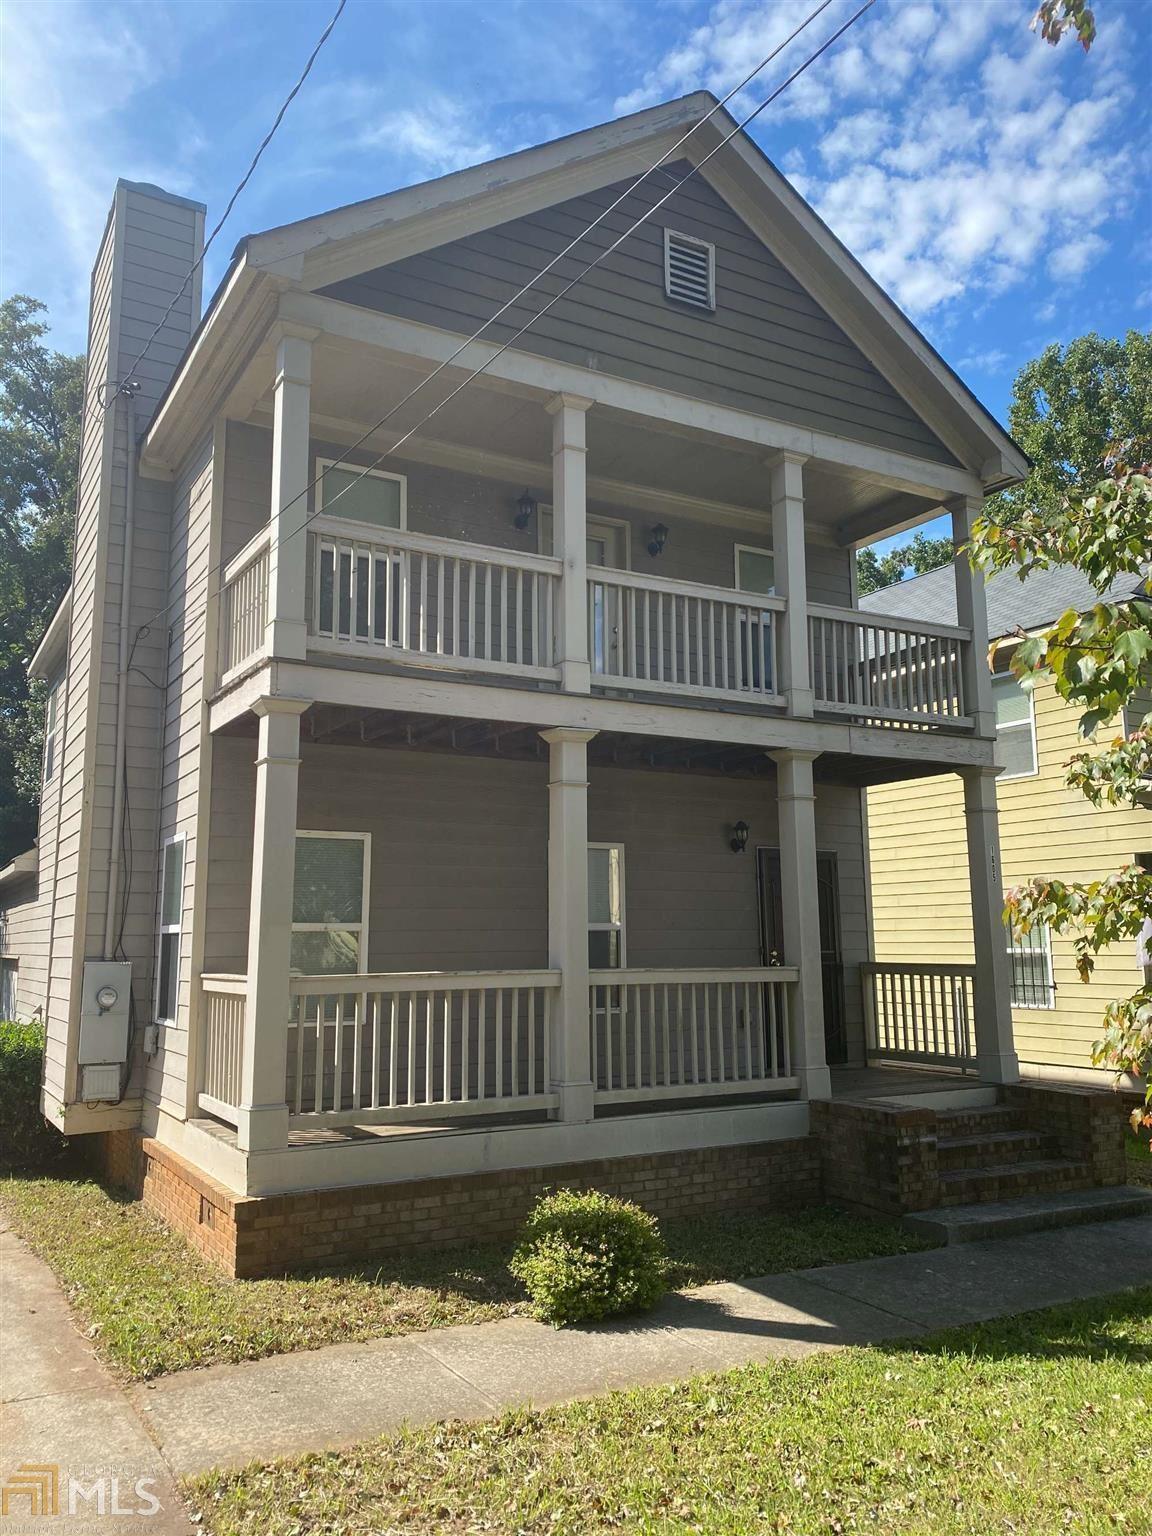 1605 Se Jonesboro Rd, Atlanta, GA 30315 - MLS#: 8862645